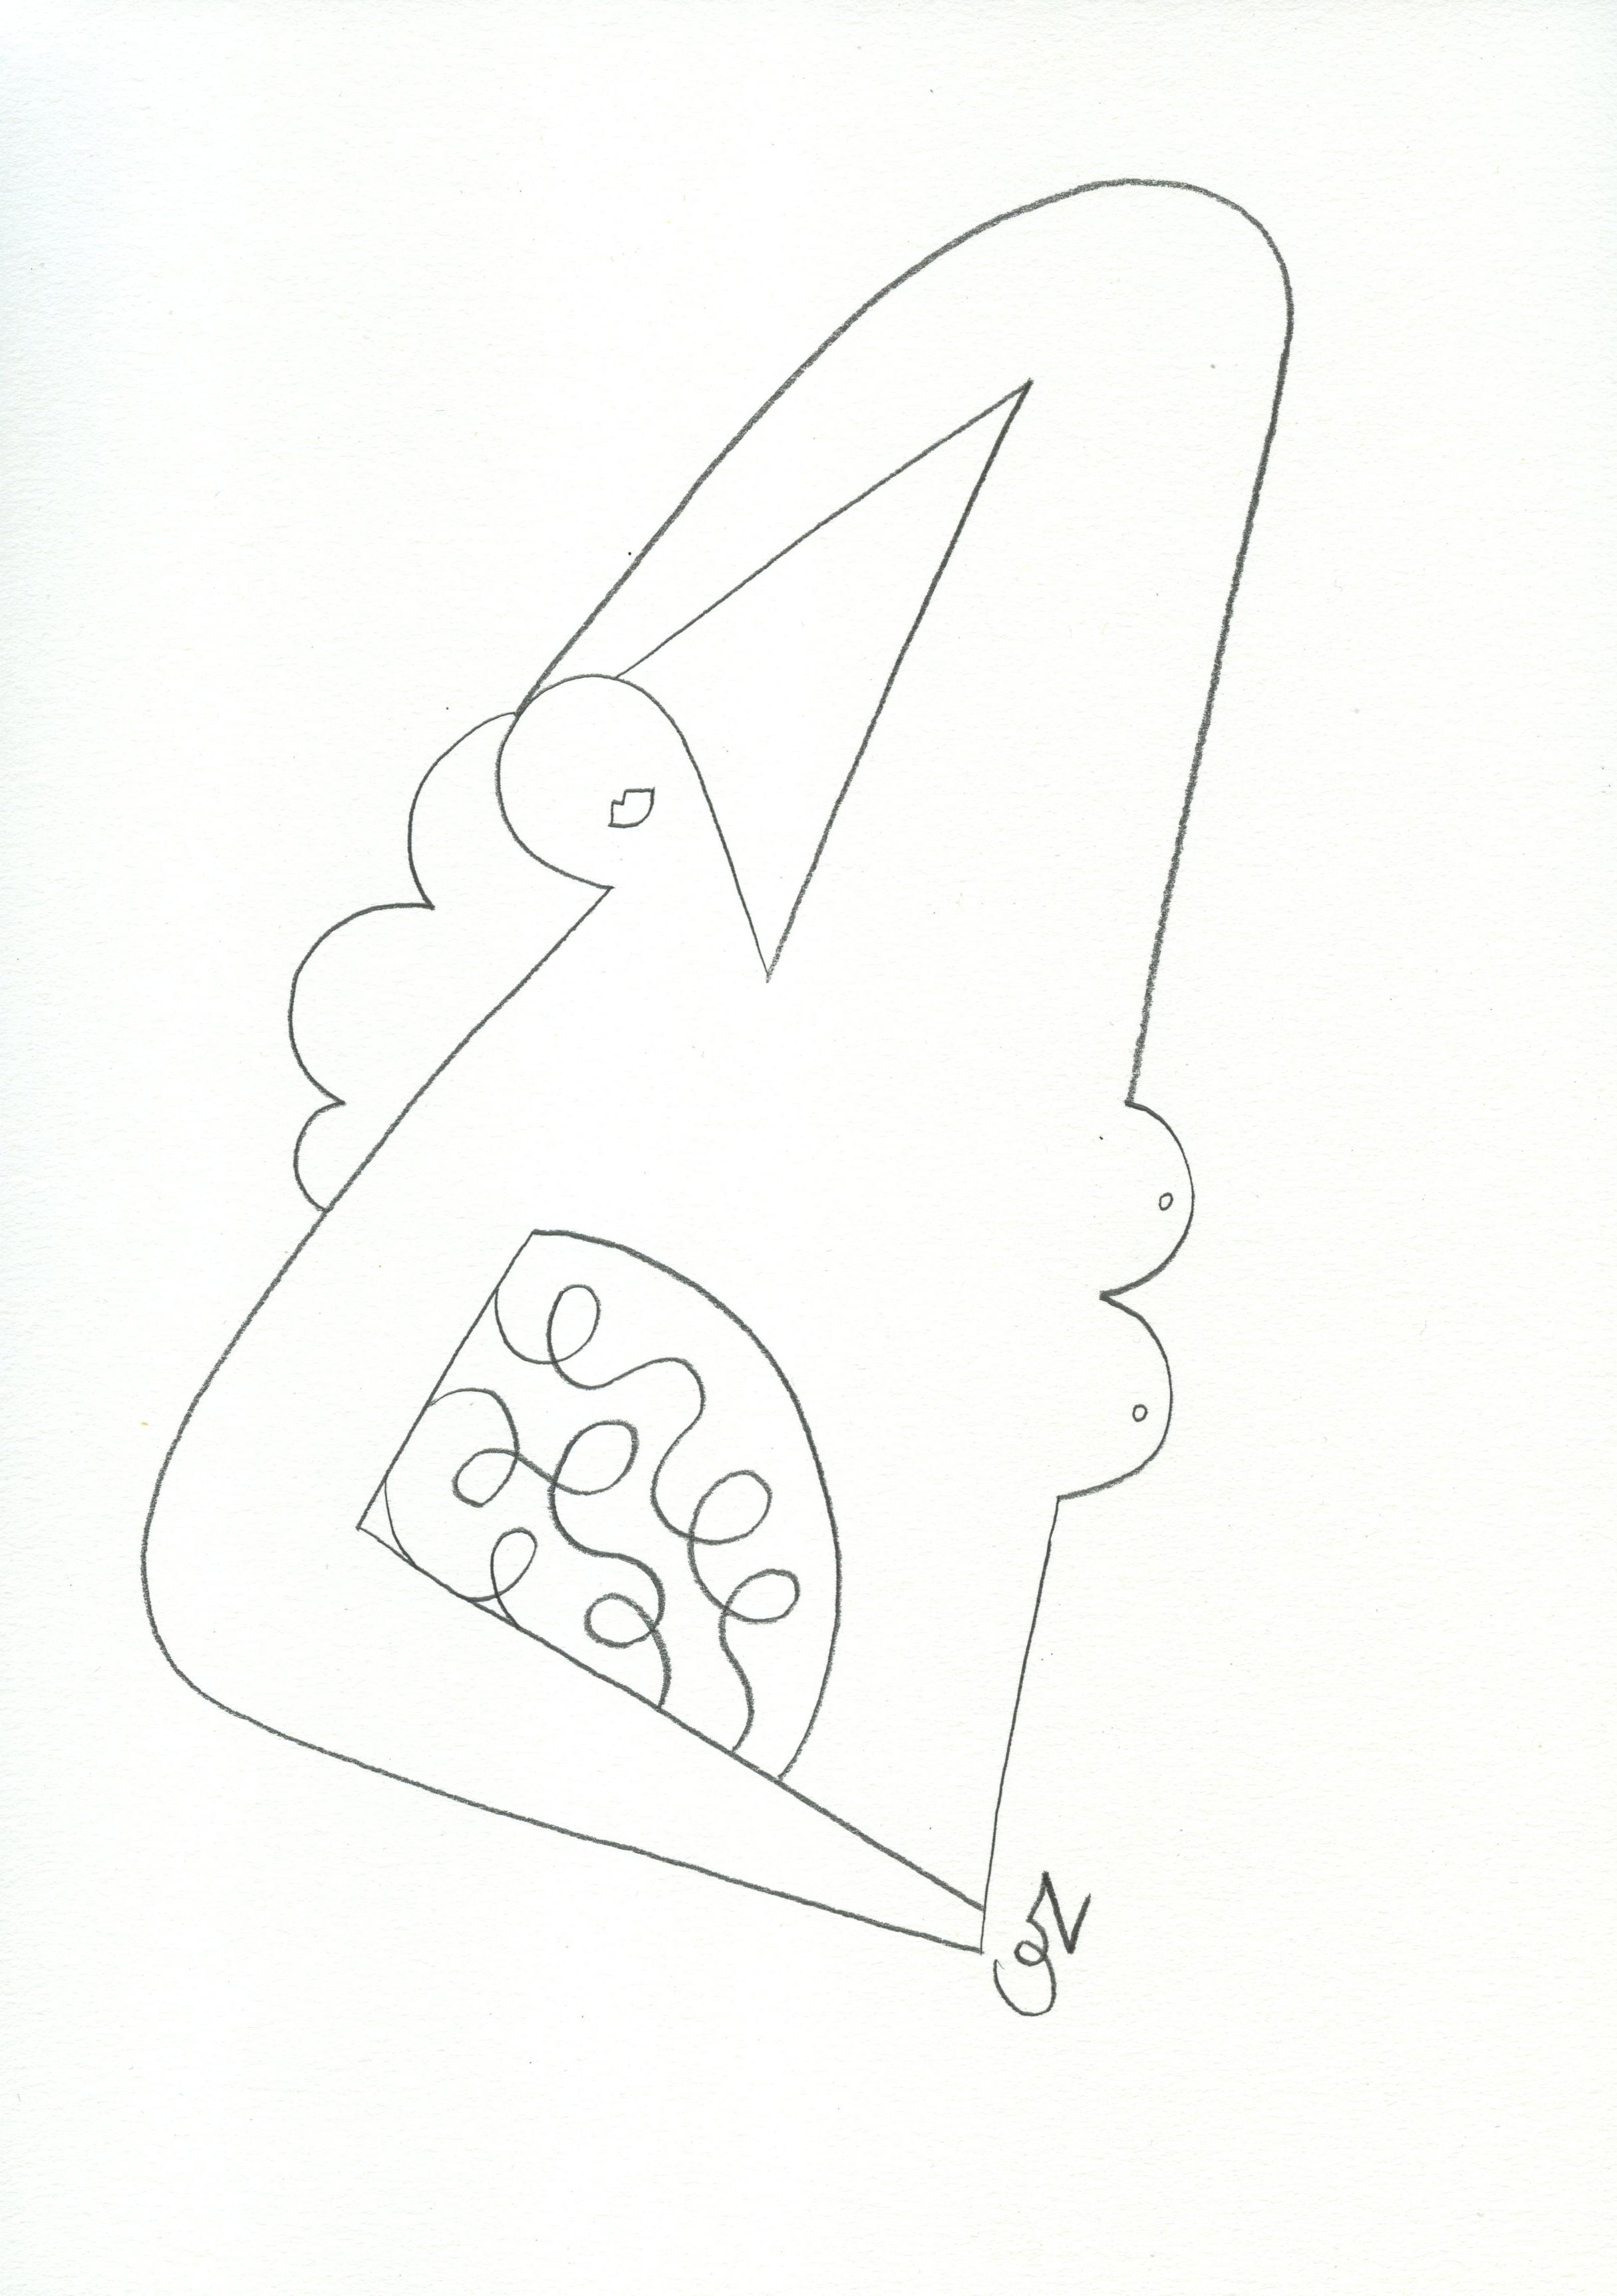 Olimpia Zagnoli, How to eat spaghetti like a lady4, 2017, pencil on paper, 29×21 cm